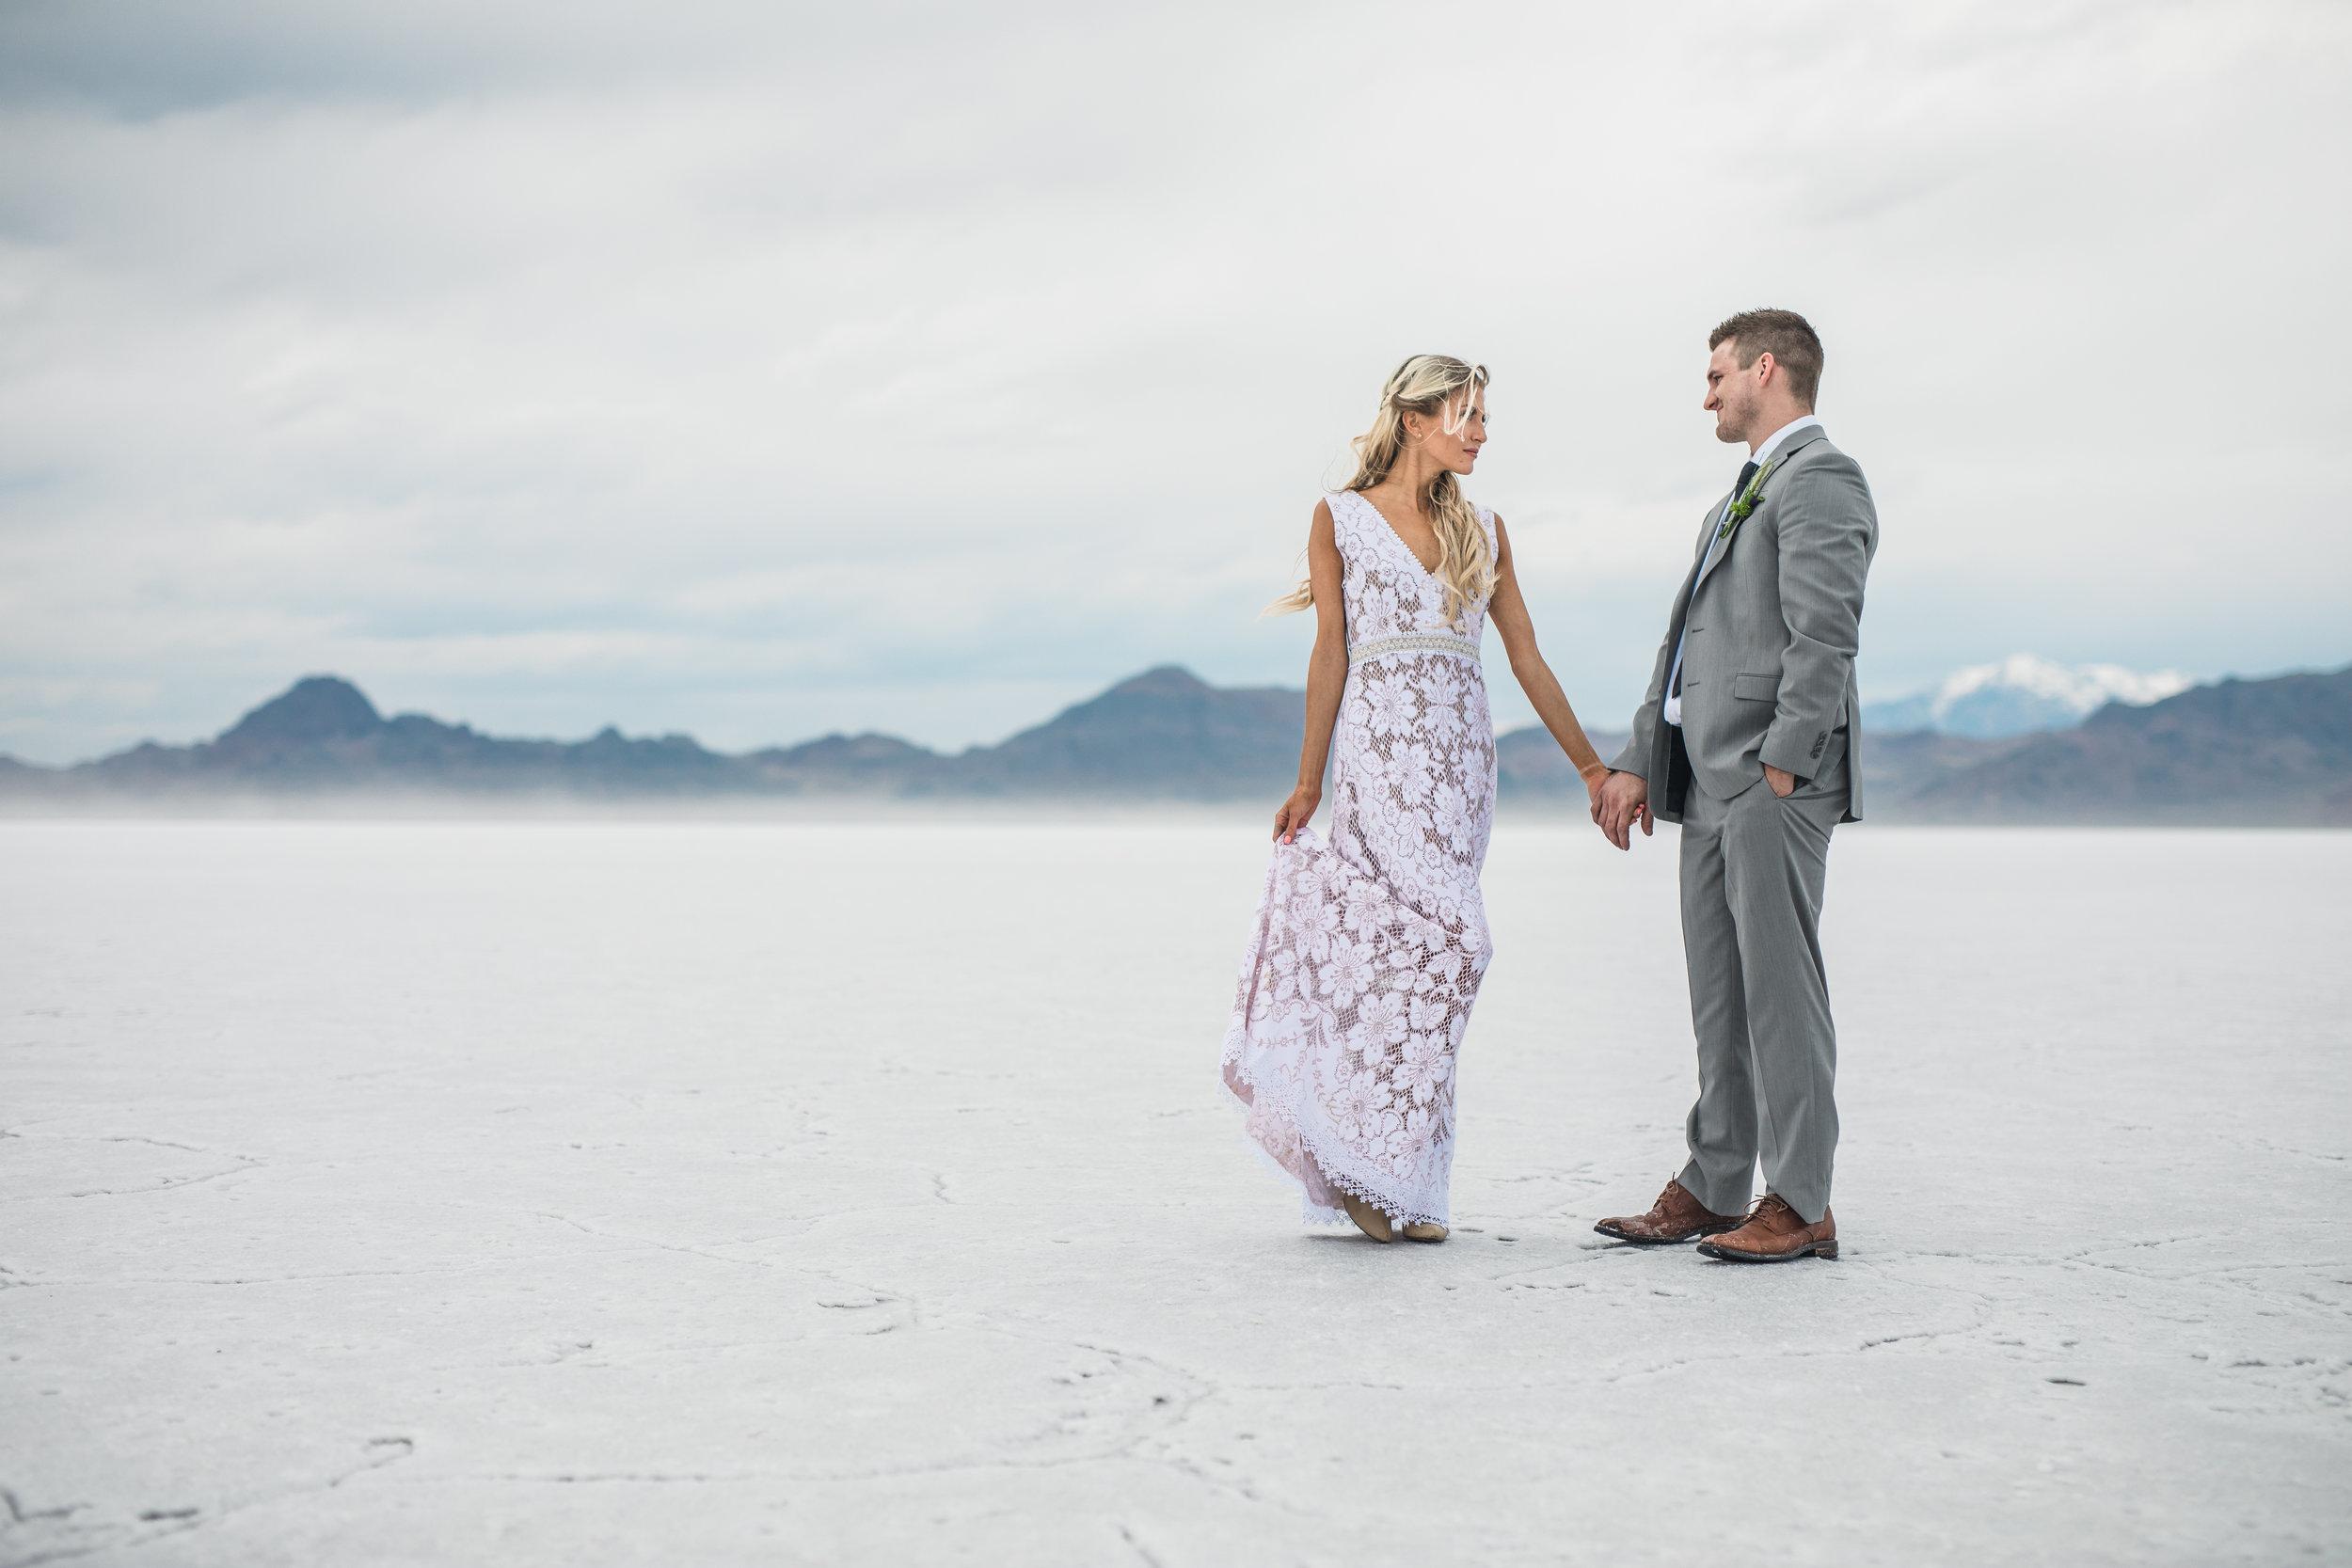 Bonneville Salt Flats adventure wedding photography